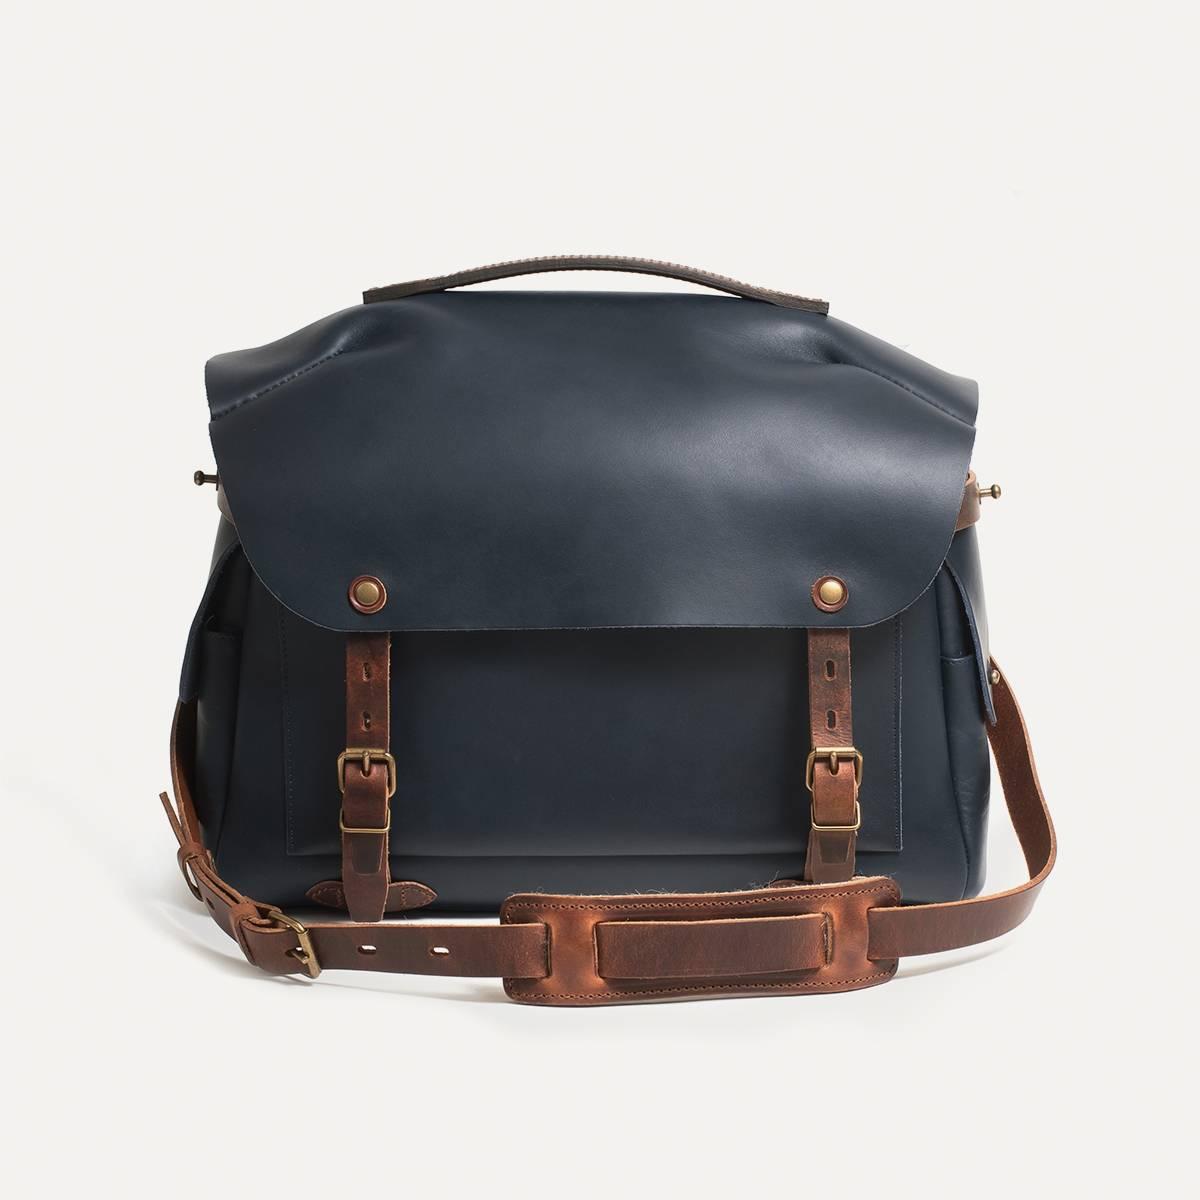 sac photo arles olympus x bleu de chauffe bleu de chauffe. Black Bedroom Furniture Sets. Home Design Ideas